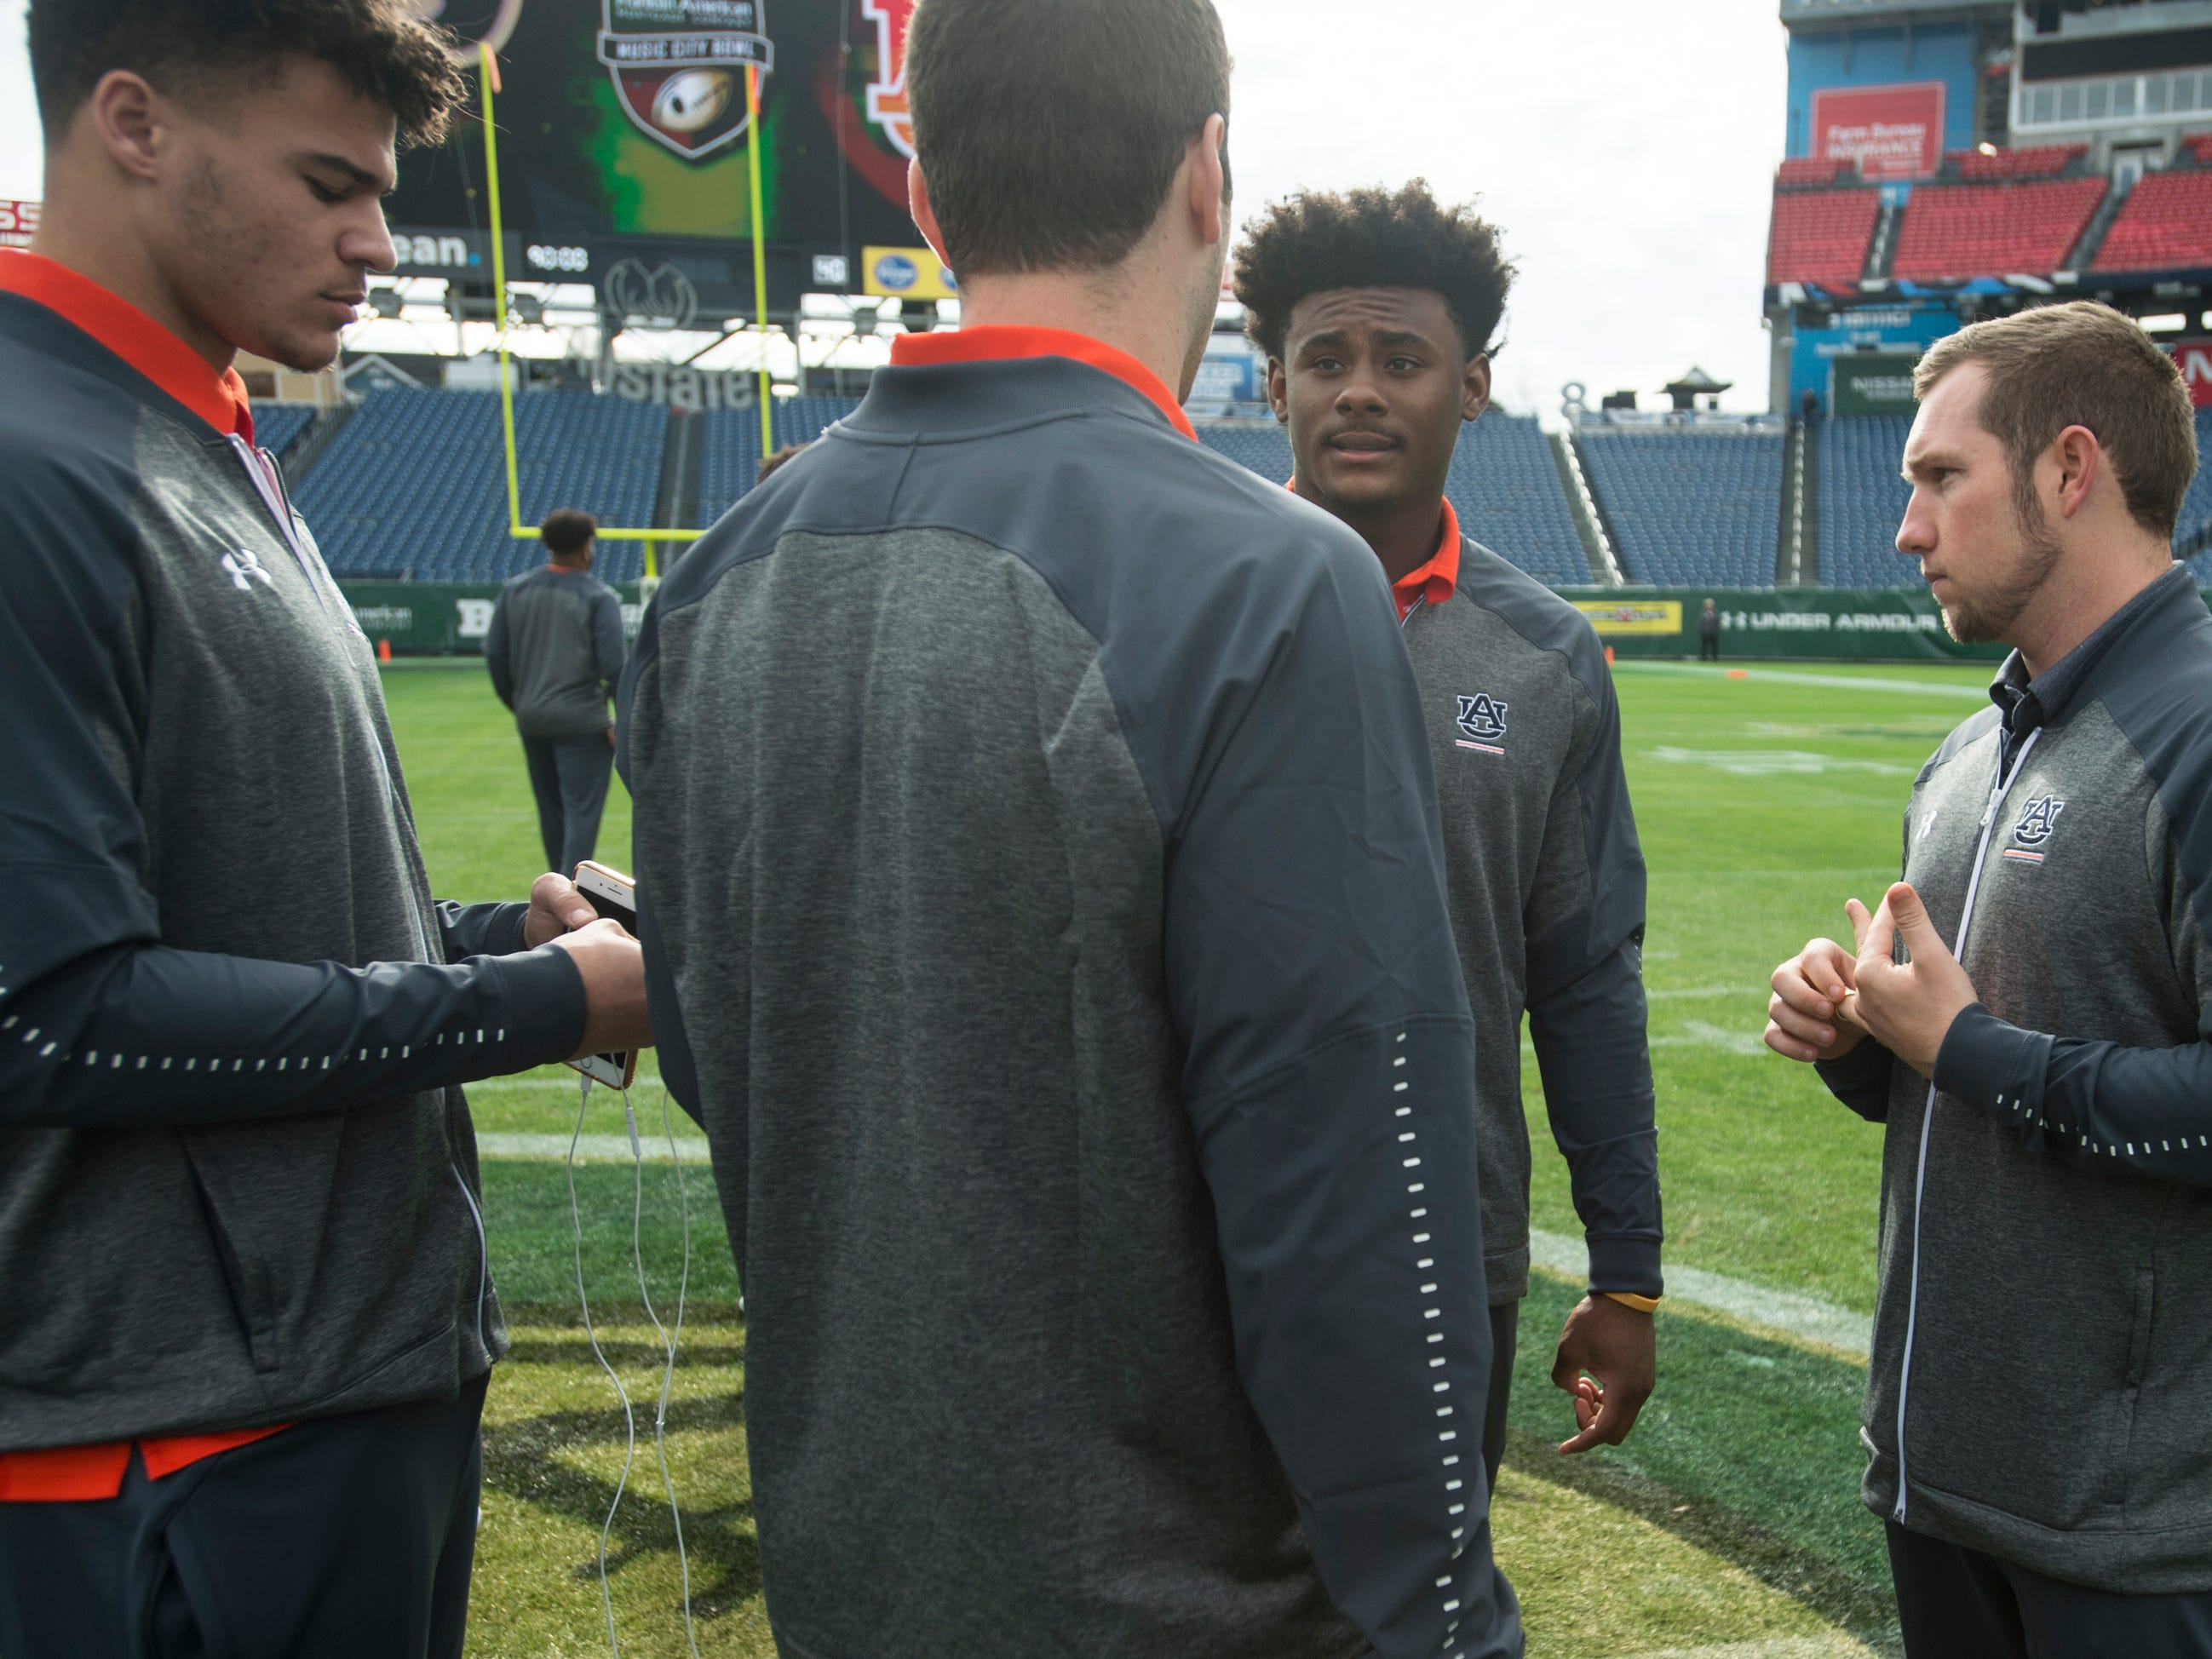 Auburn offensive coordinator Kenny Dillingham (far right) talks with quarterbacks Joey Gatewood (left), Jarrett Stidham (center) and Malik Willis (right) on the field before taking on Purdue in the Music City Bowl at Nissan Stadium in Nashville, Tenn., on Friday, Dec. 28, 2018.